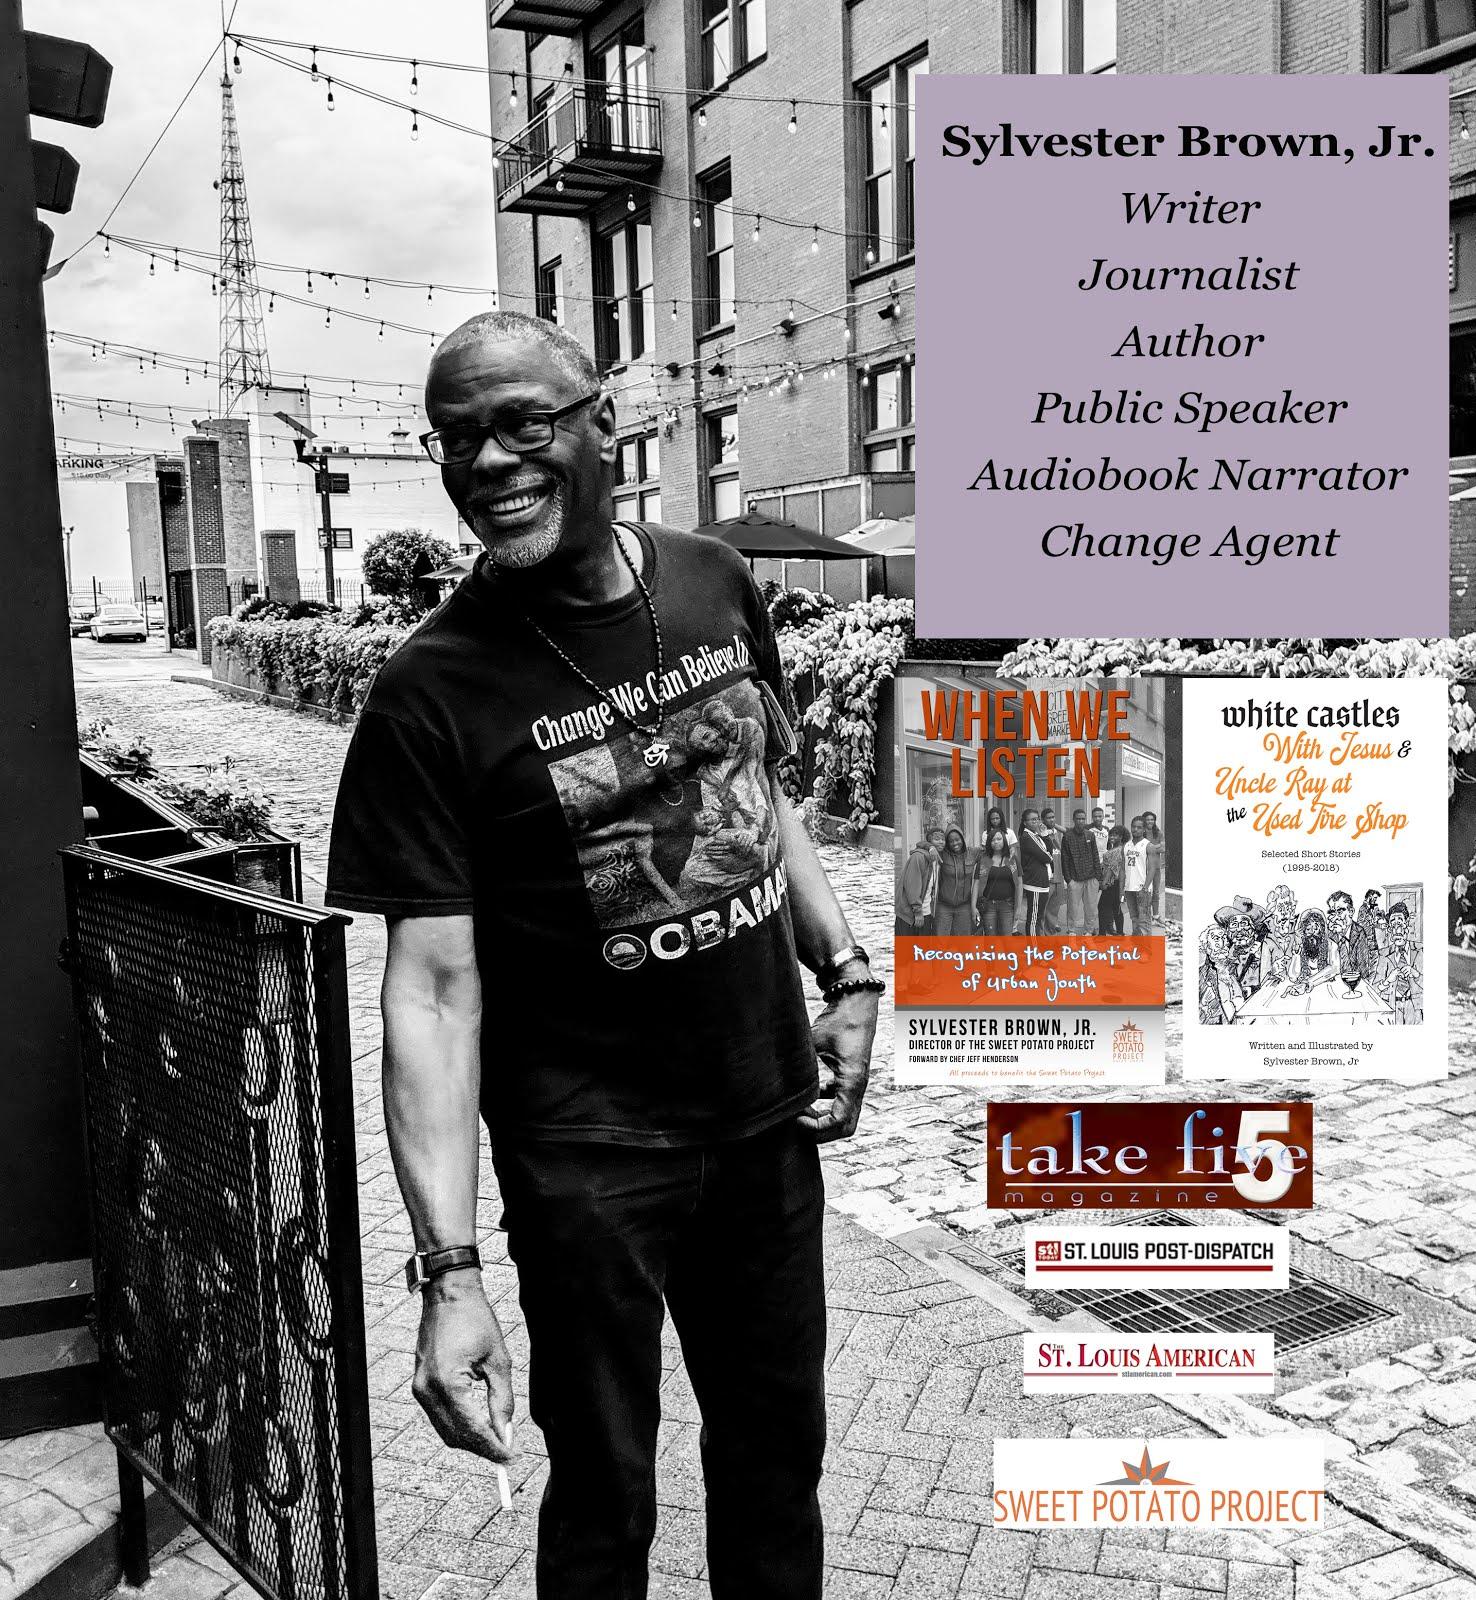 Sylvester Brown, Jr.-Writer